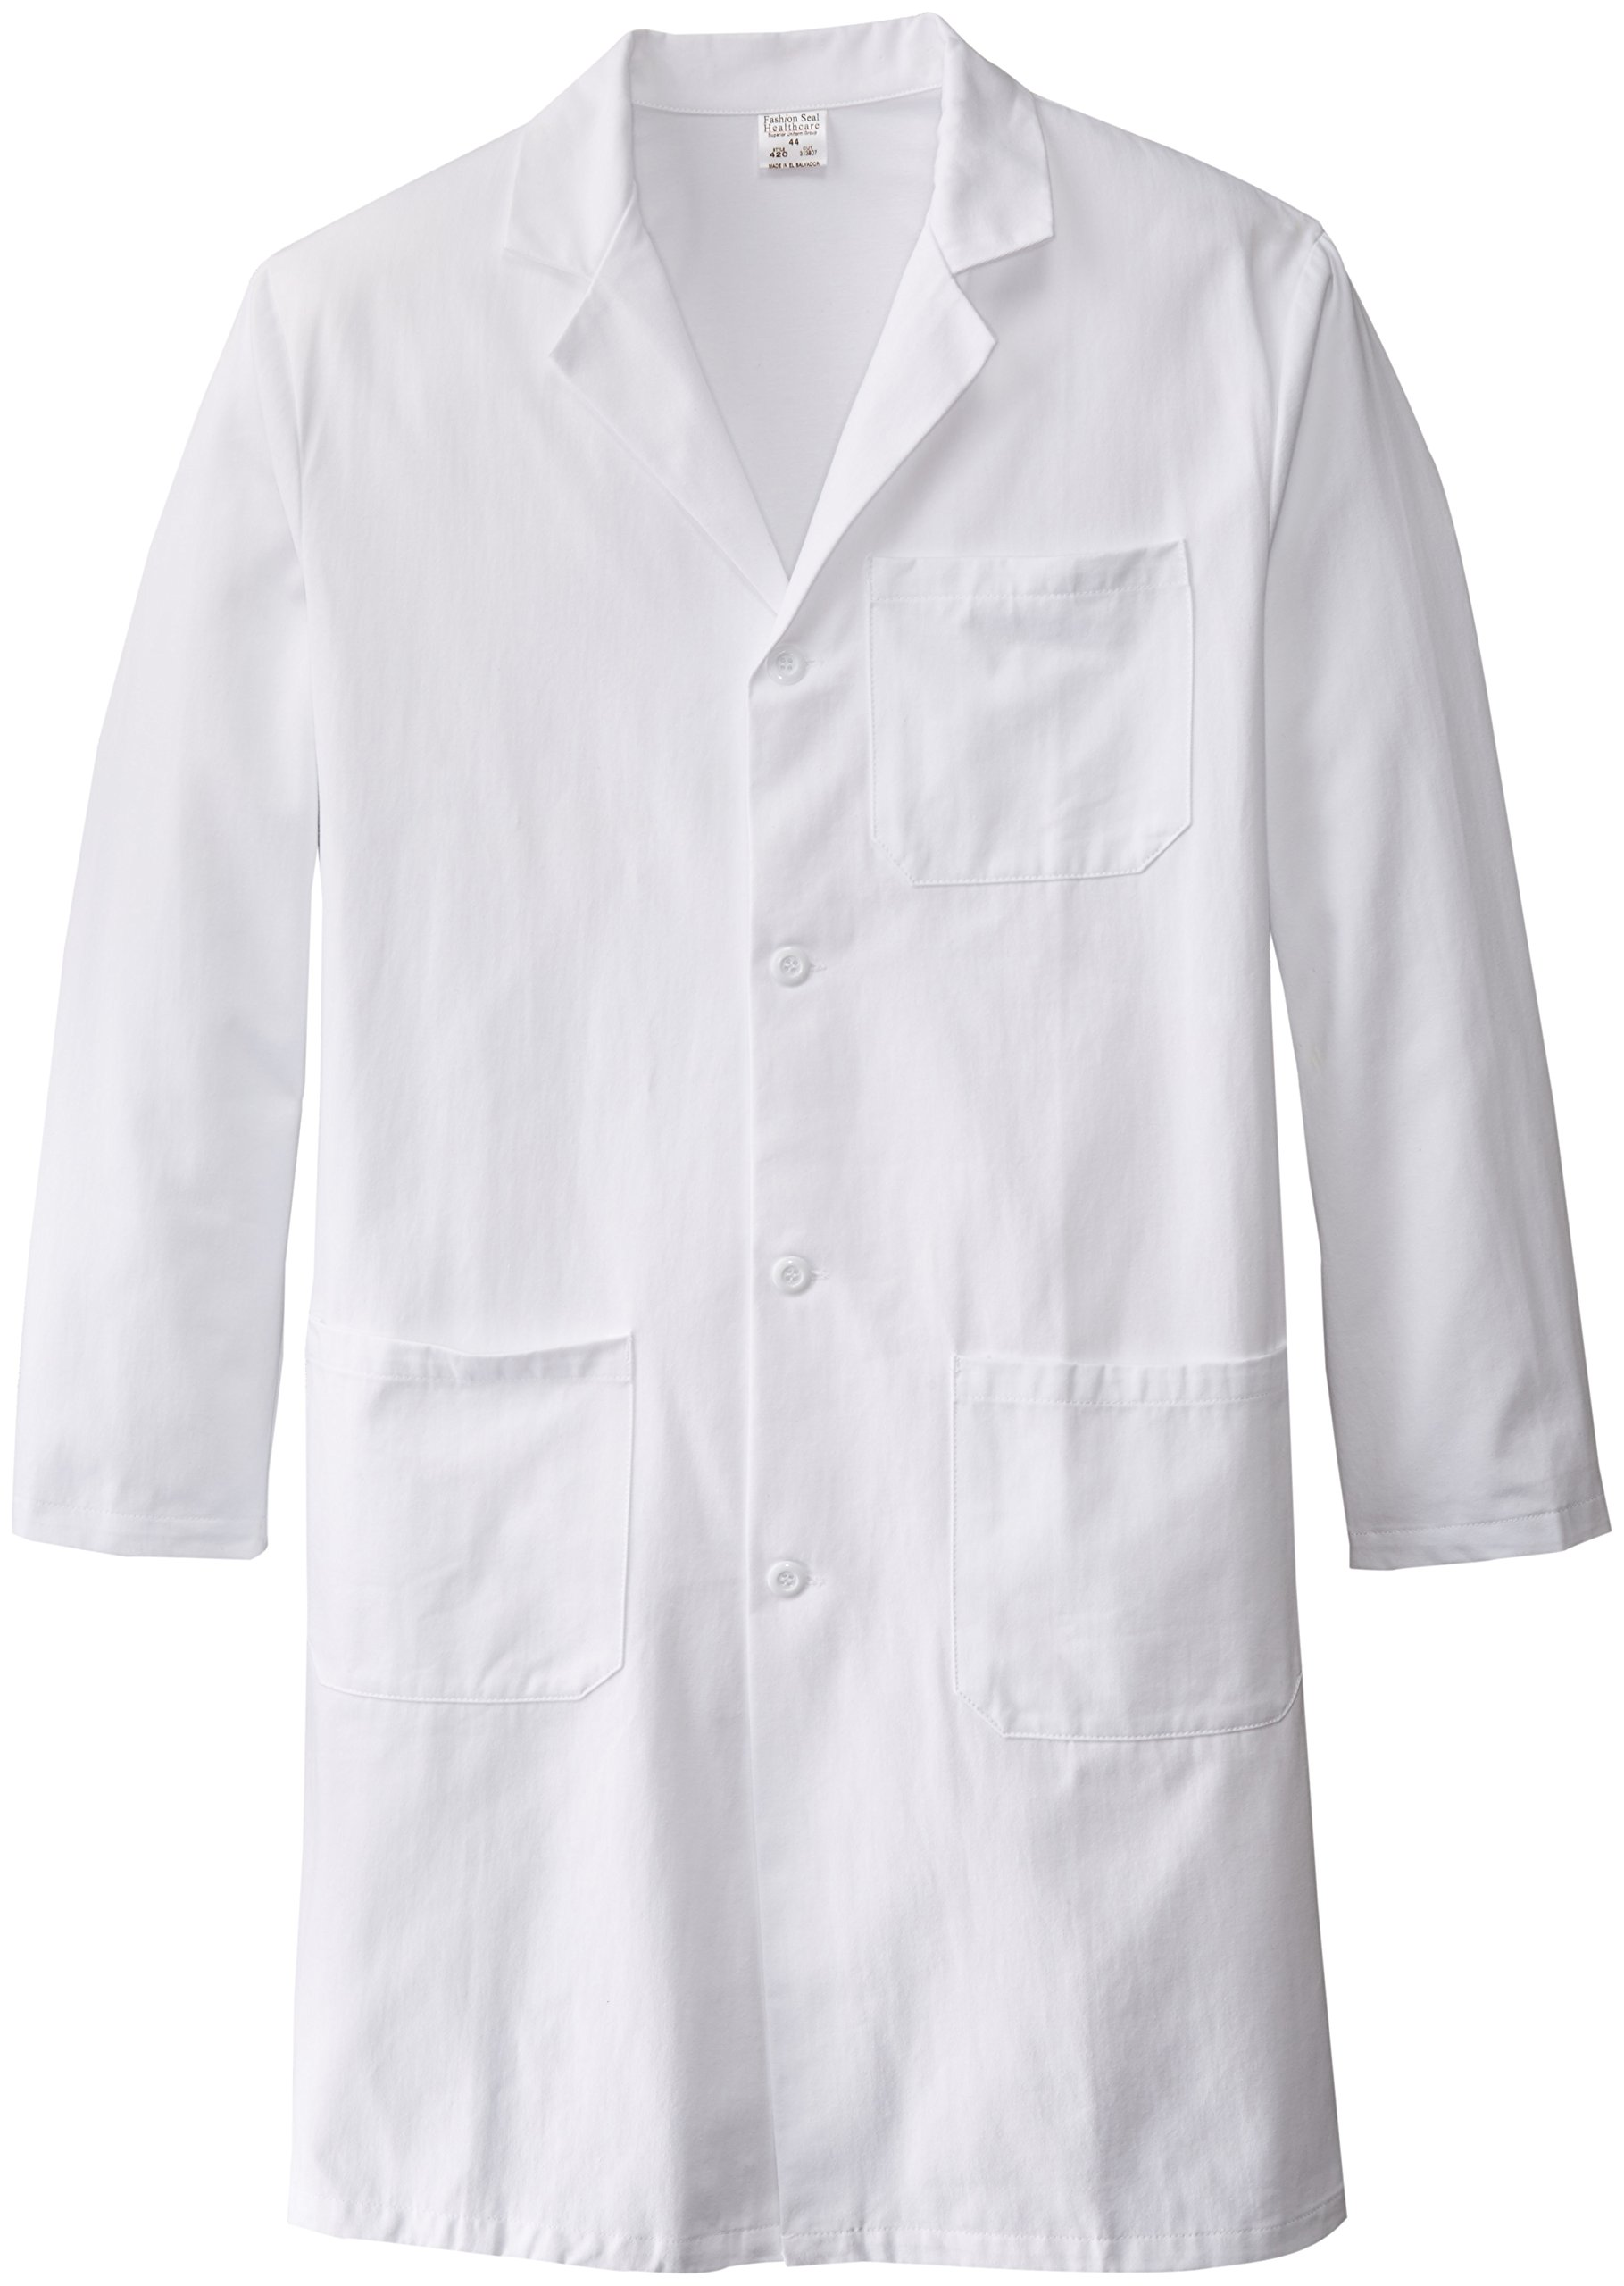 Worklon 420-44 100% Sanforized Cotton Heavyweight Twill Men's Knee Length Lab Coat, Button Front, White, 41'' Length, Size 44